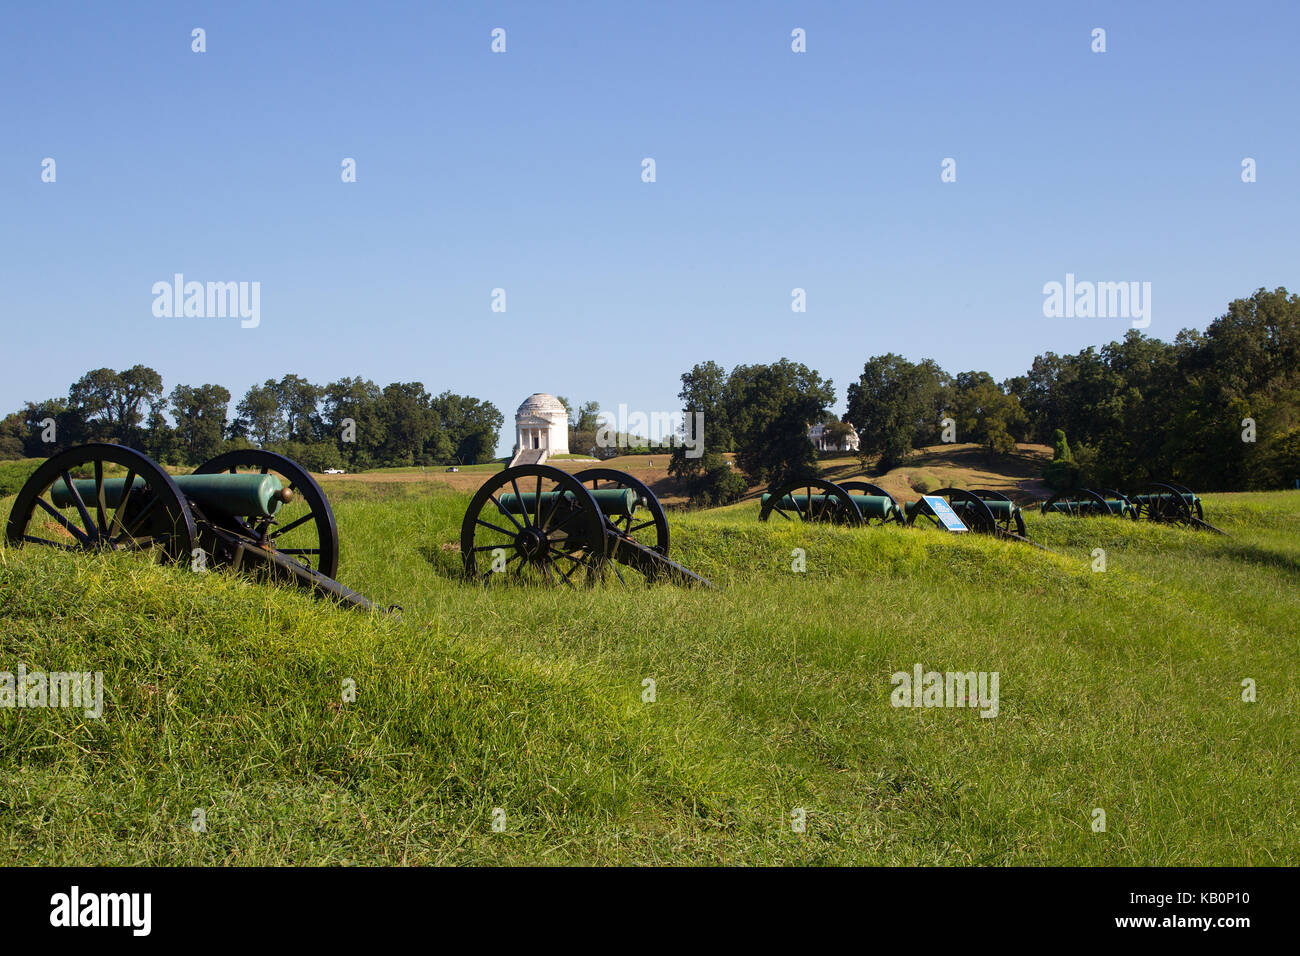 Cannons on the Vicksburg Battlefield - Stock Image